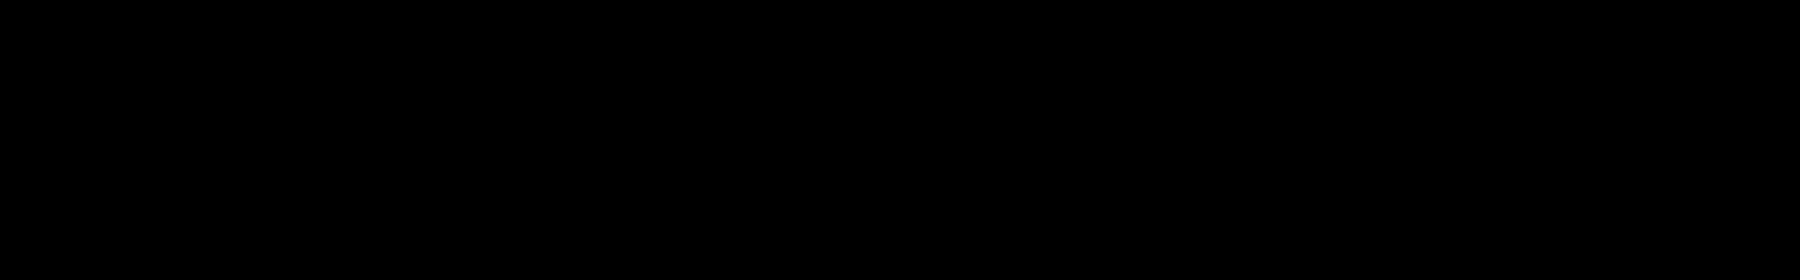 Sylenth Trap Evolution audio waveform